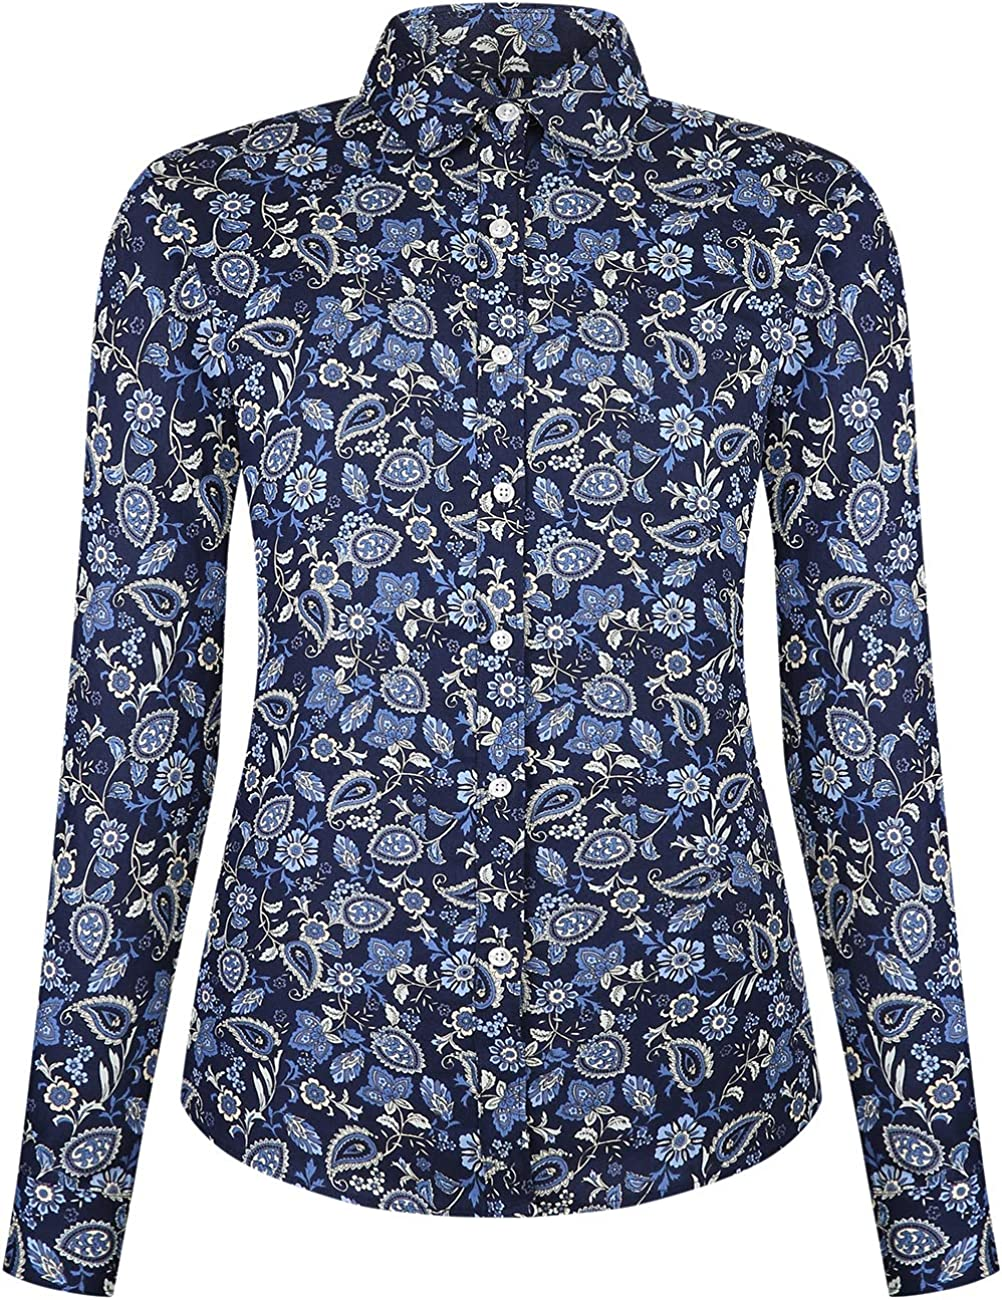 DOKKIA Women's Tops Casual Blouses Floral Cotton Long Sleeve Work Button Up Dress Shirt